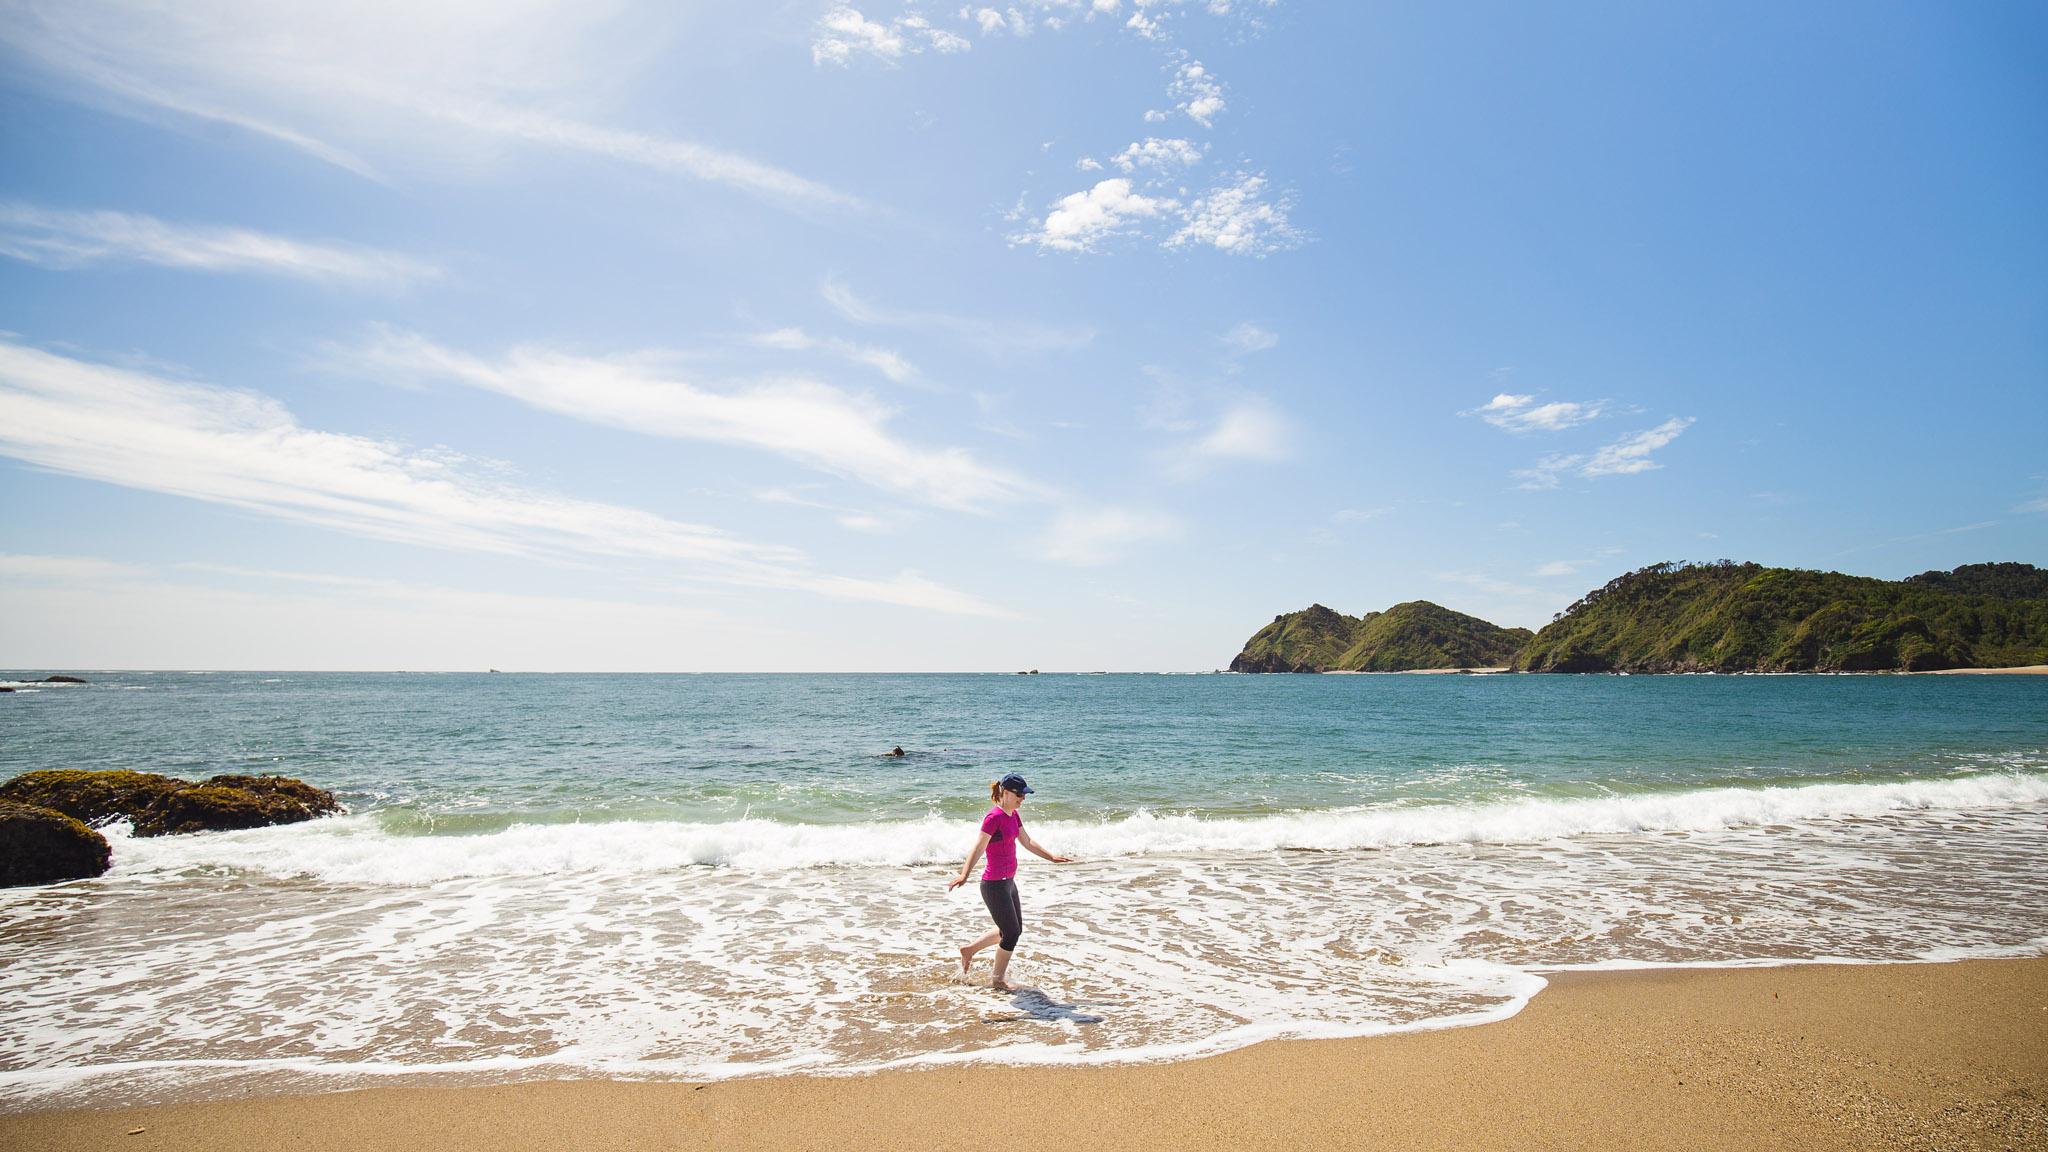 chile-chiloe-beach-ocean-colecole-3